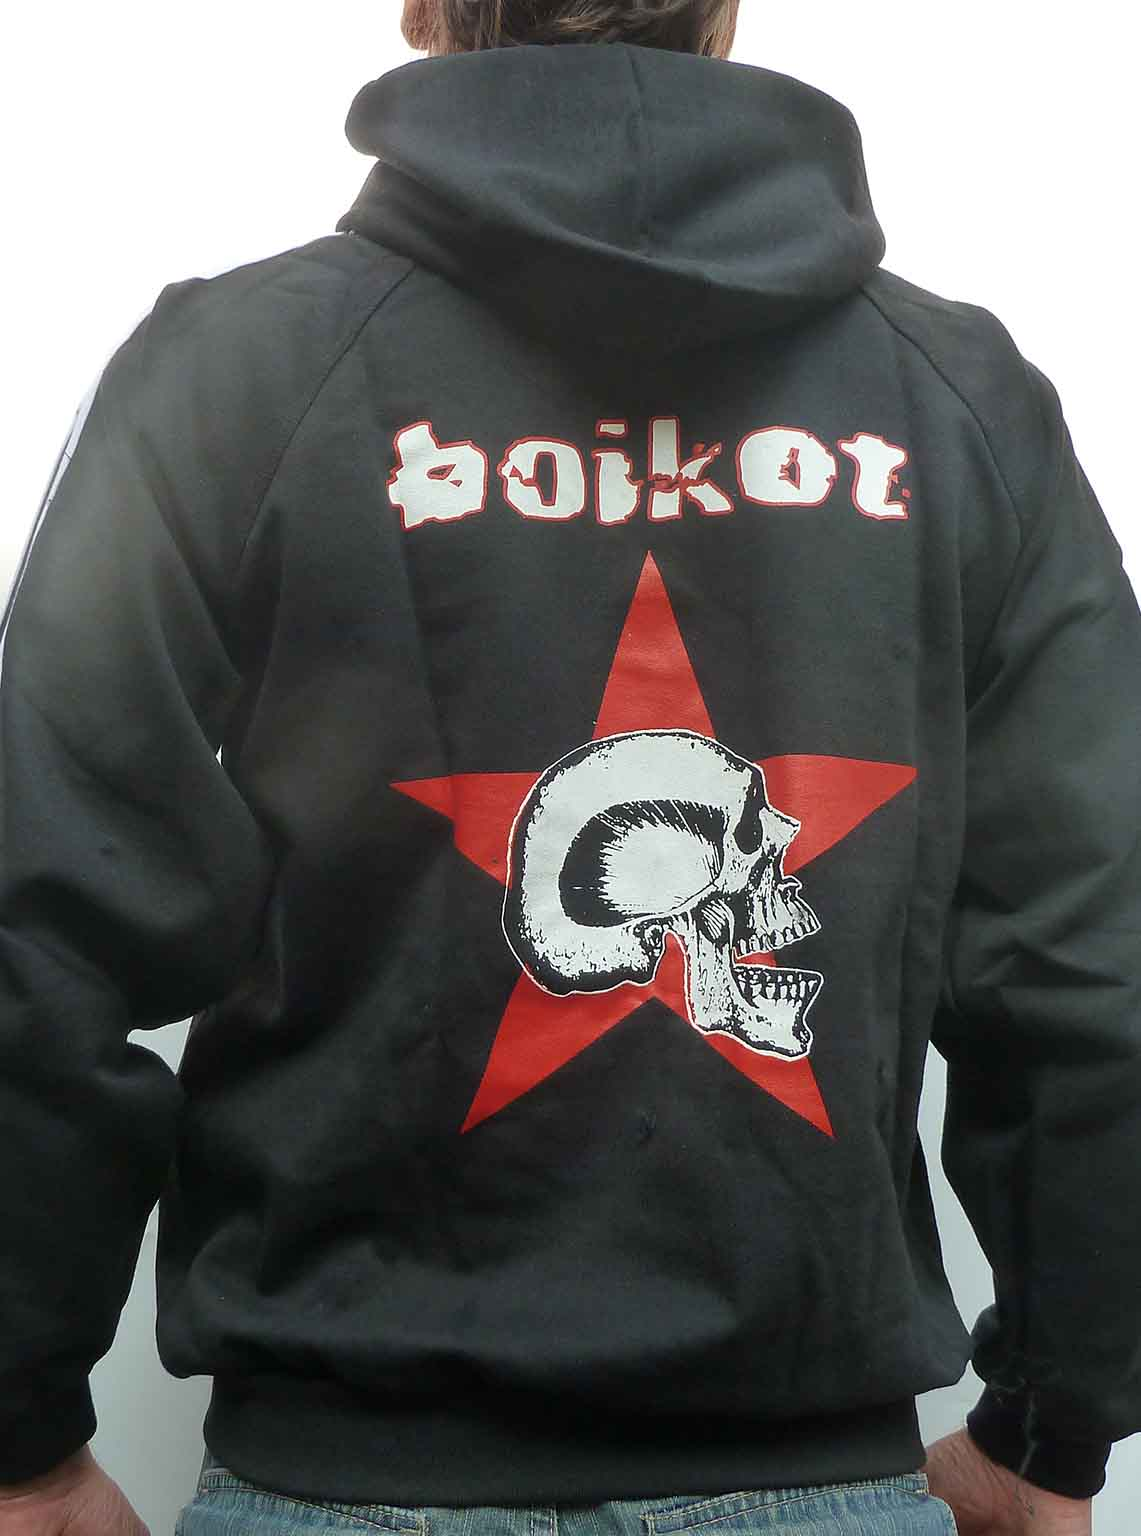 boikot_sud_Detras